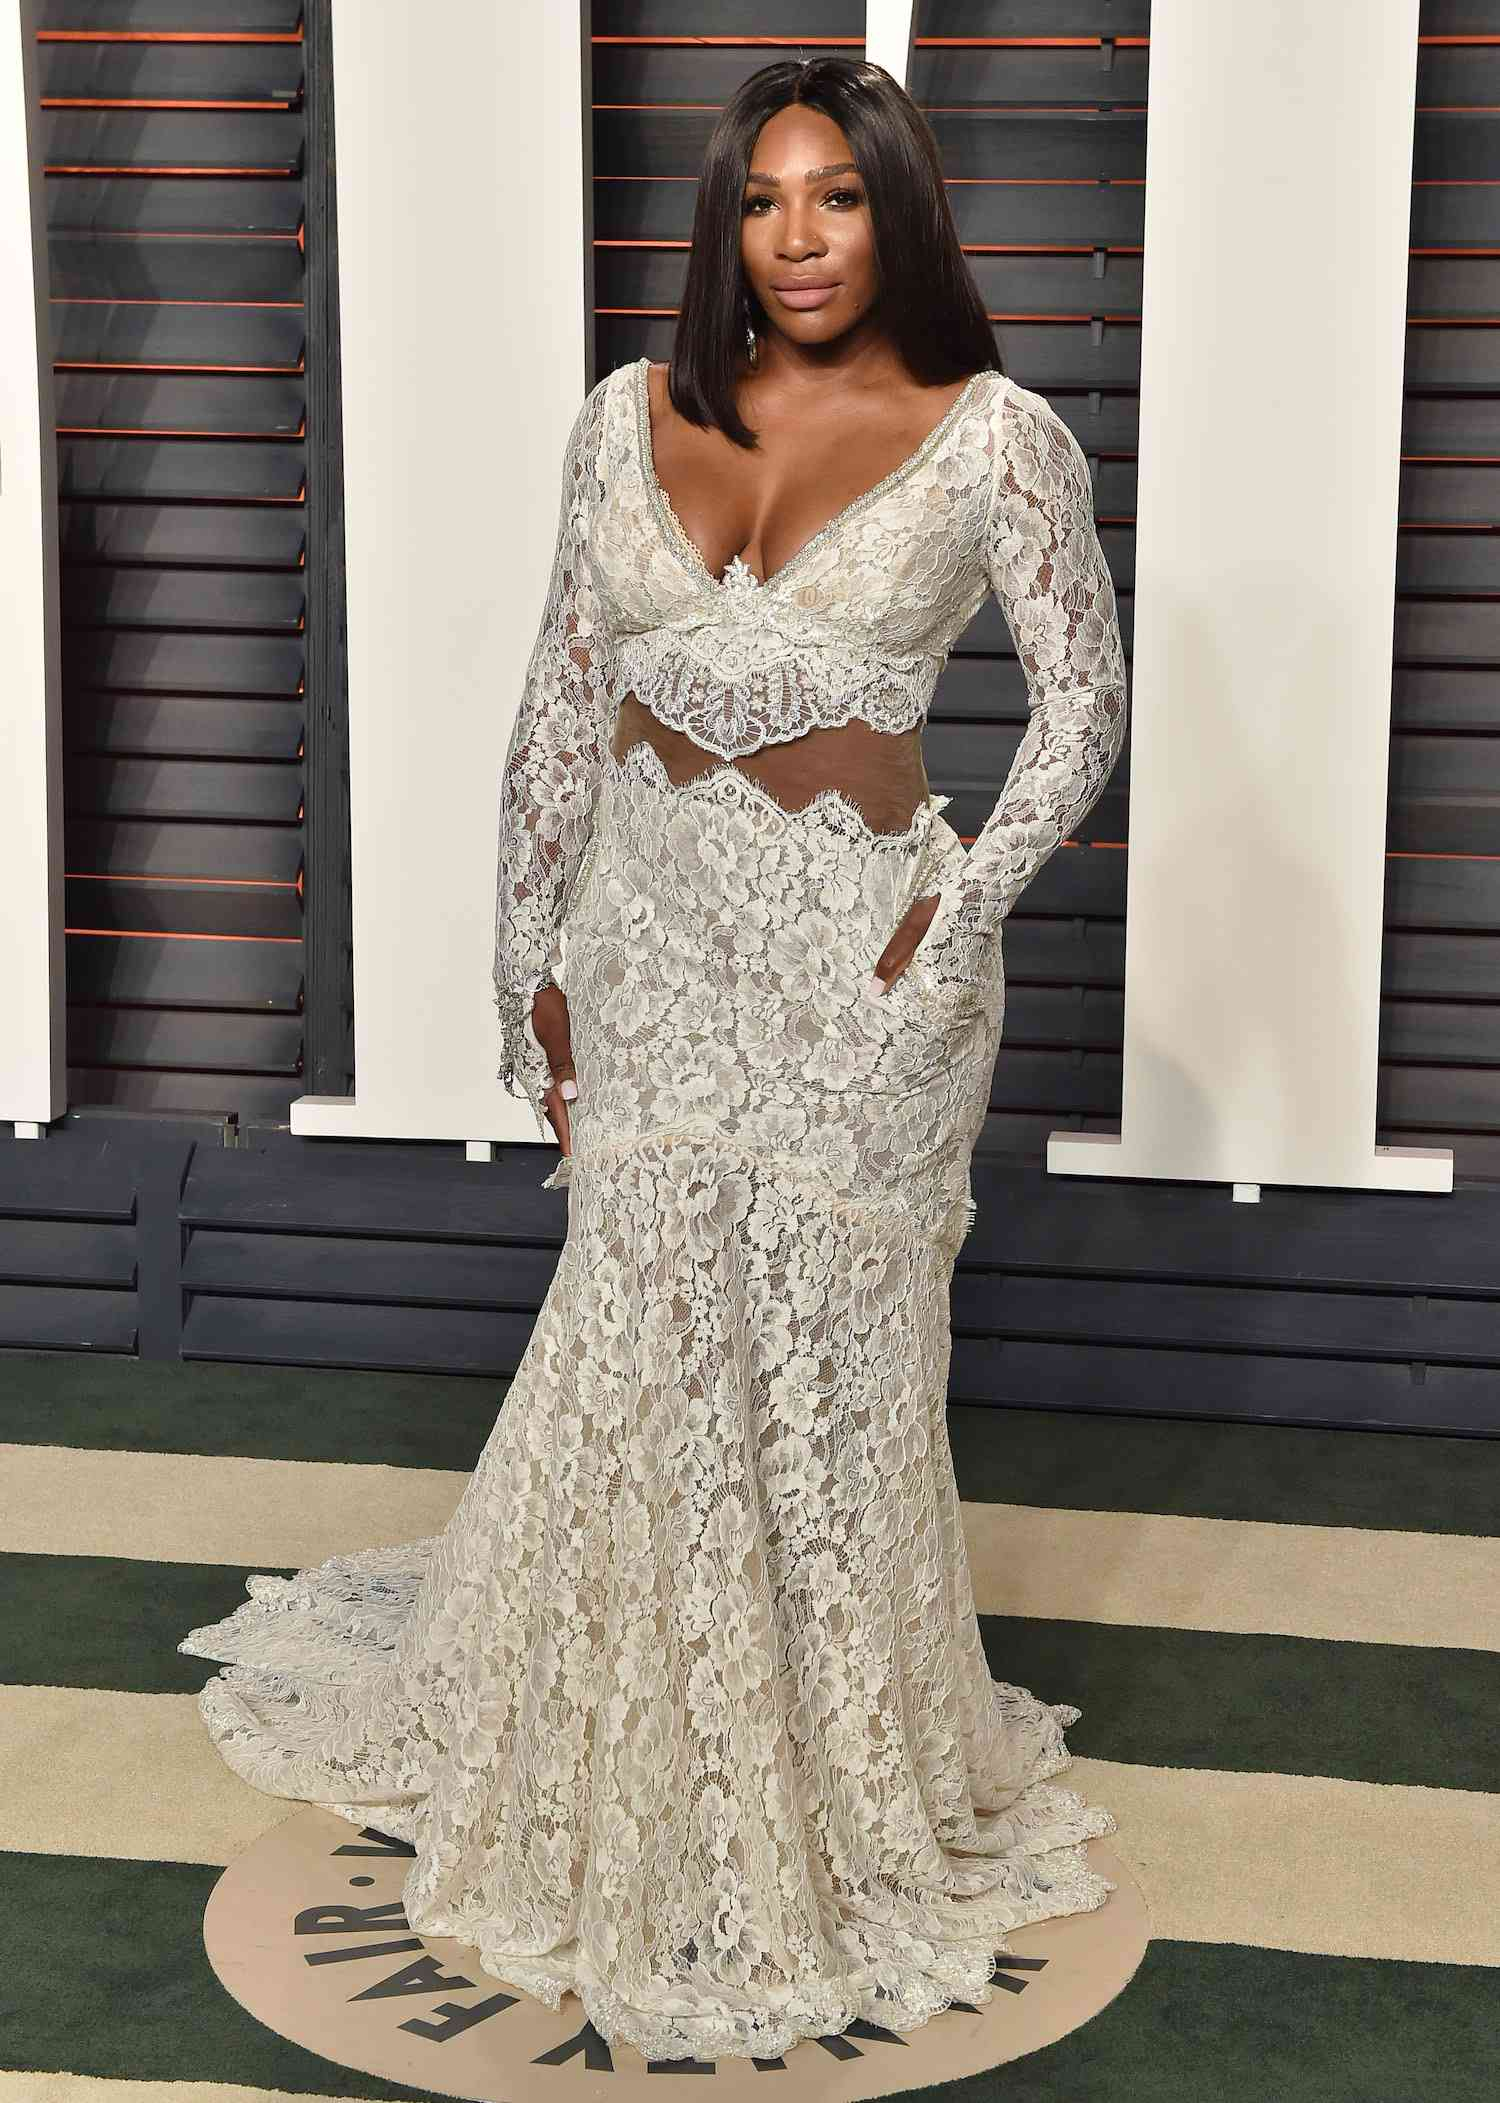 Serena Williams 2016 Vanity Fair Oscars Party